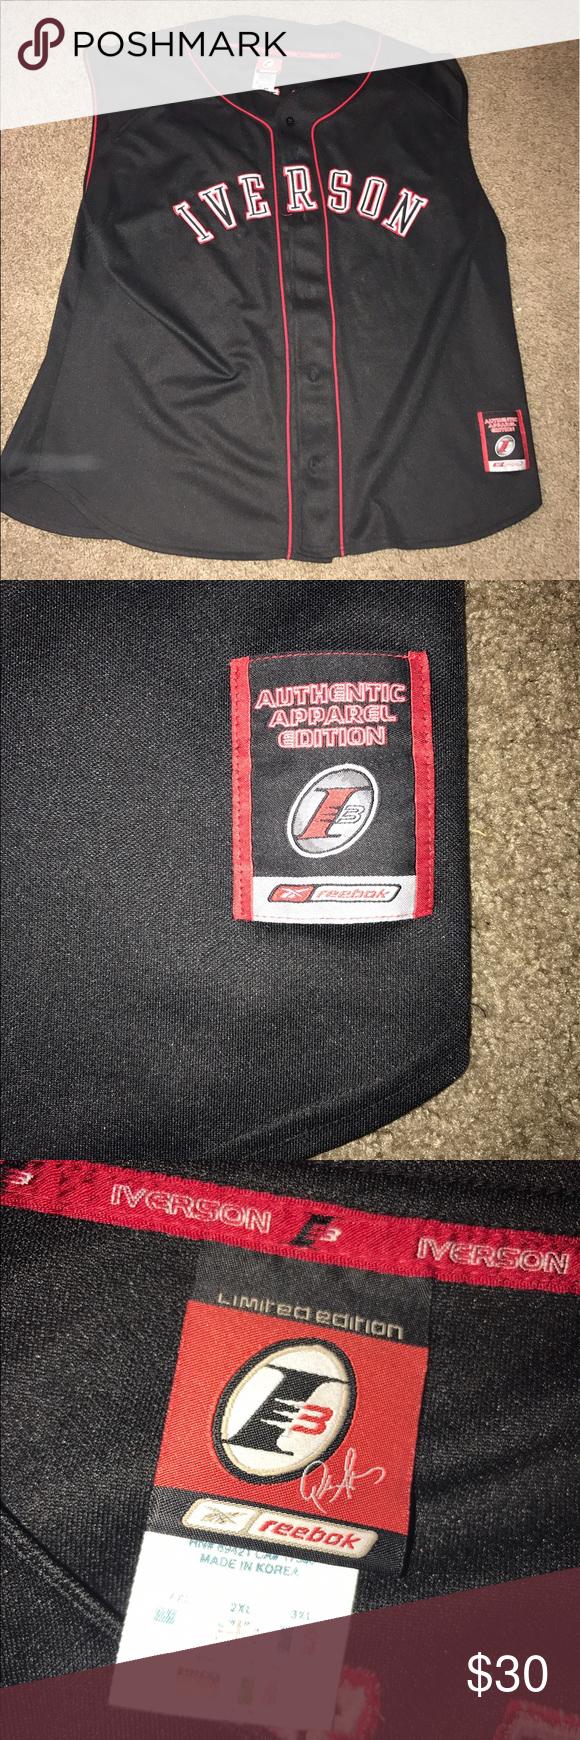 low priced 5b46d 85586 Allen iverson Reebok limited edition jersey Baseball jersey ...